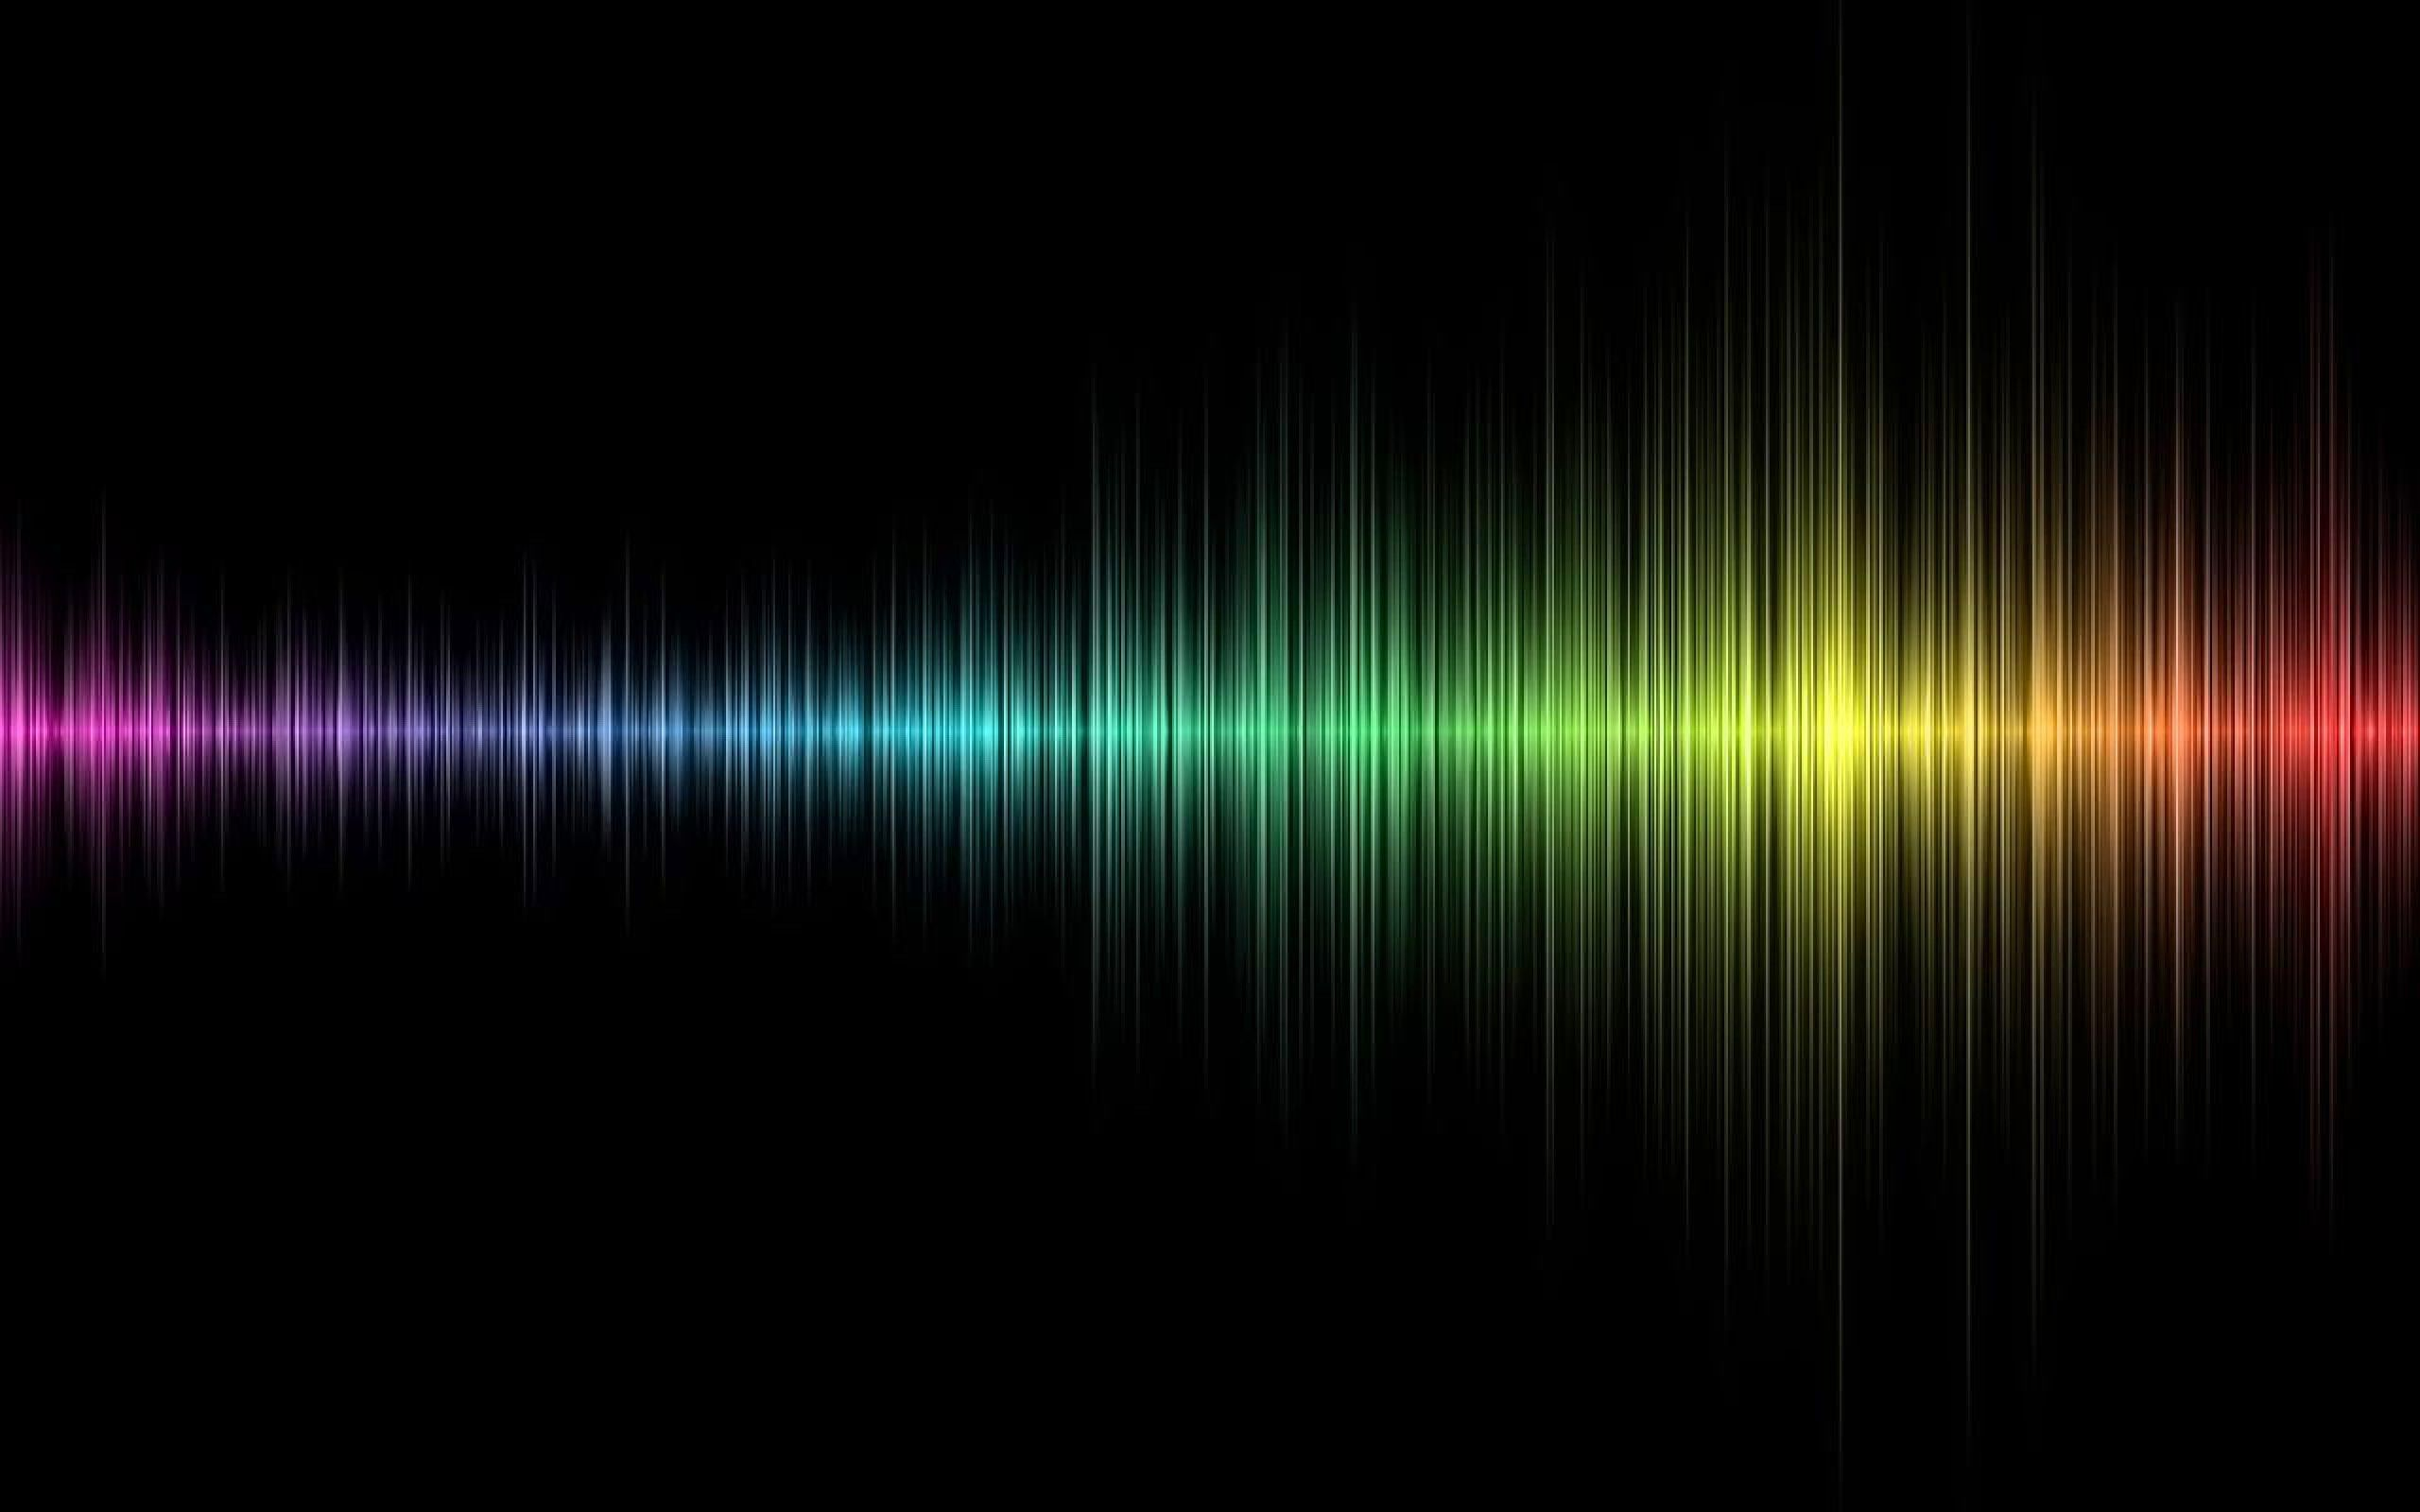 Most Inspiring Wallpaper Music Soundwave - 5d758106170fd3c46f1bd9bf3fccf5ba  Pictures_597691.jpg